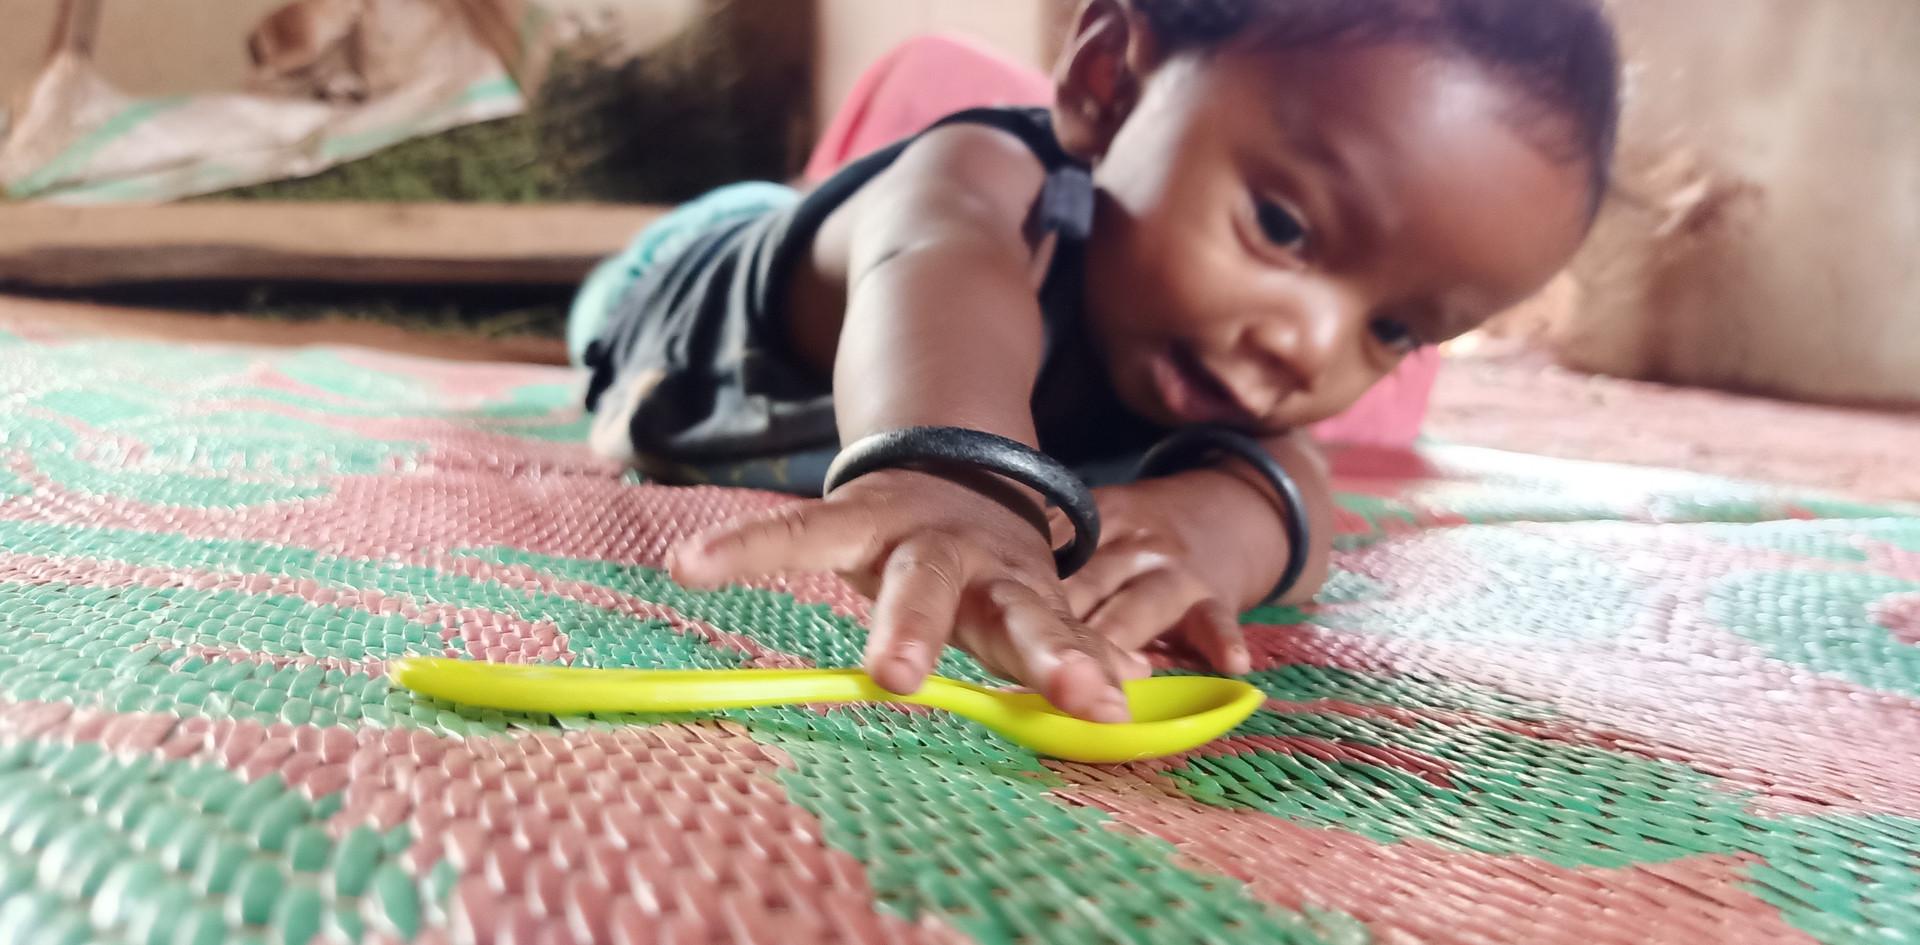 Akash reaches to the spoon - ©Prabhas Kumar